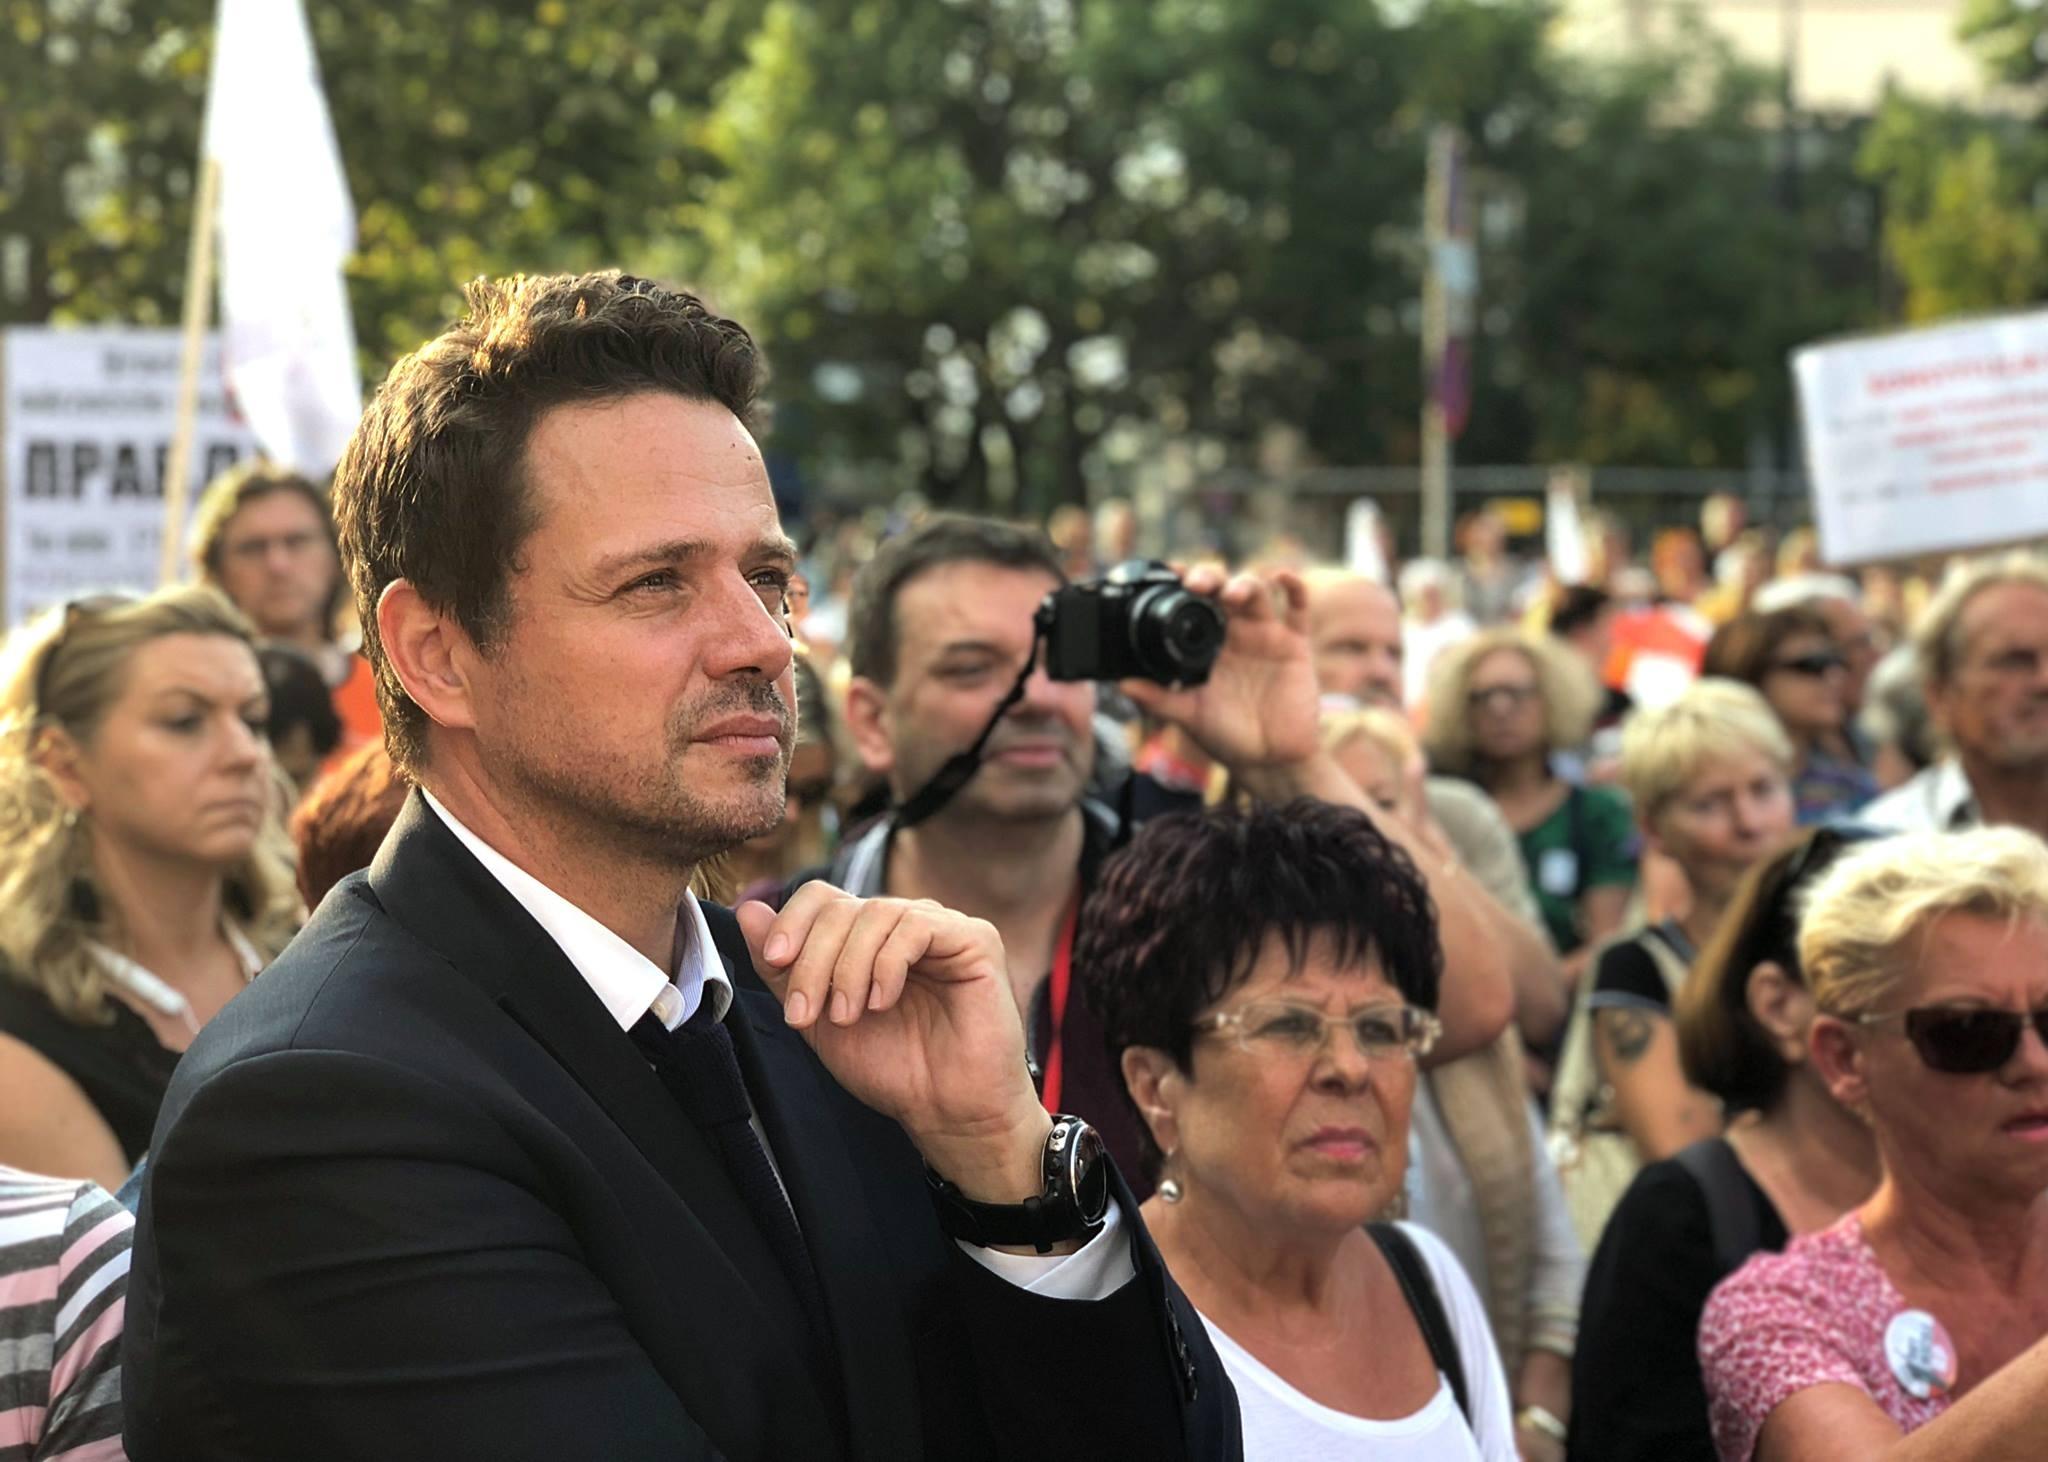 https://www.facebook.com/rafal.trzaskowski/photos/